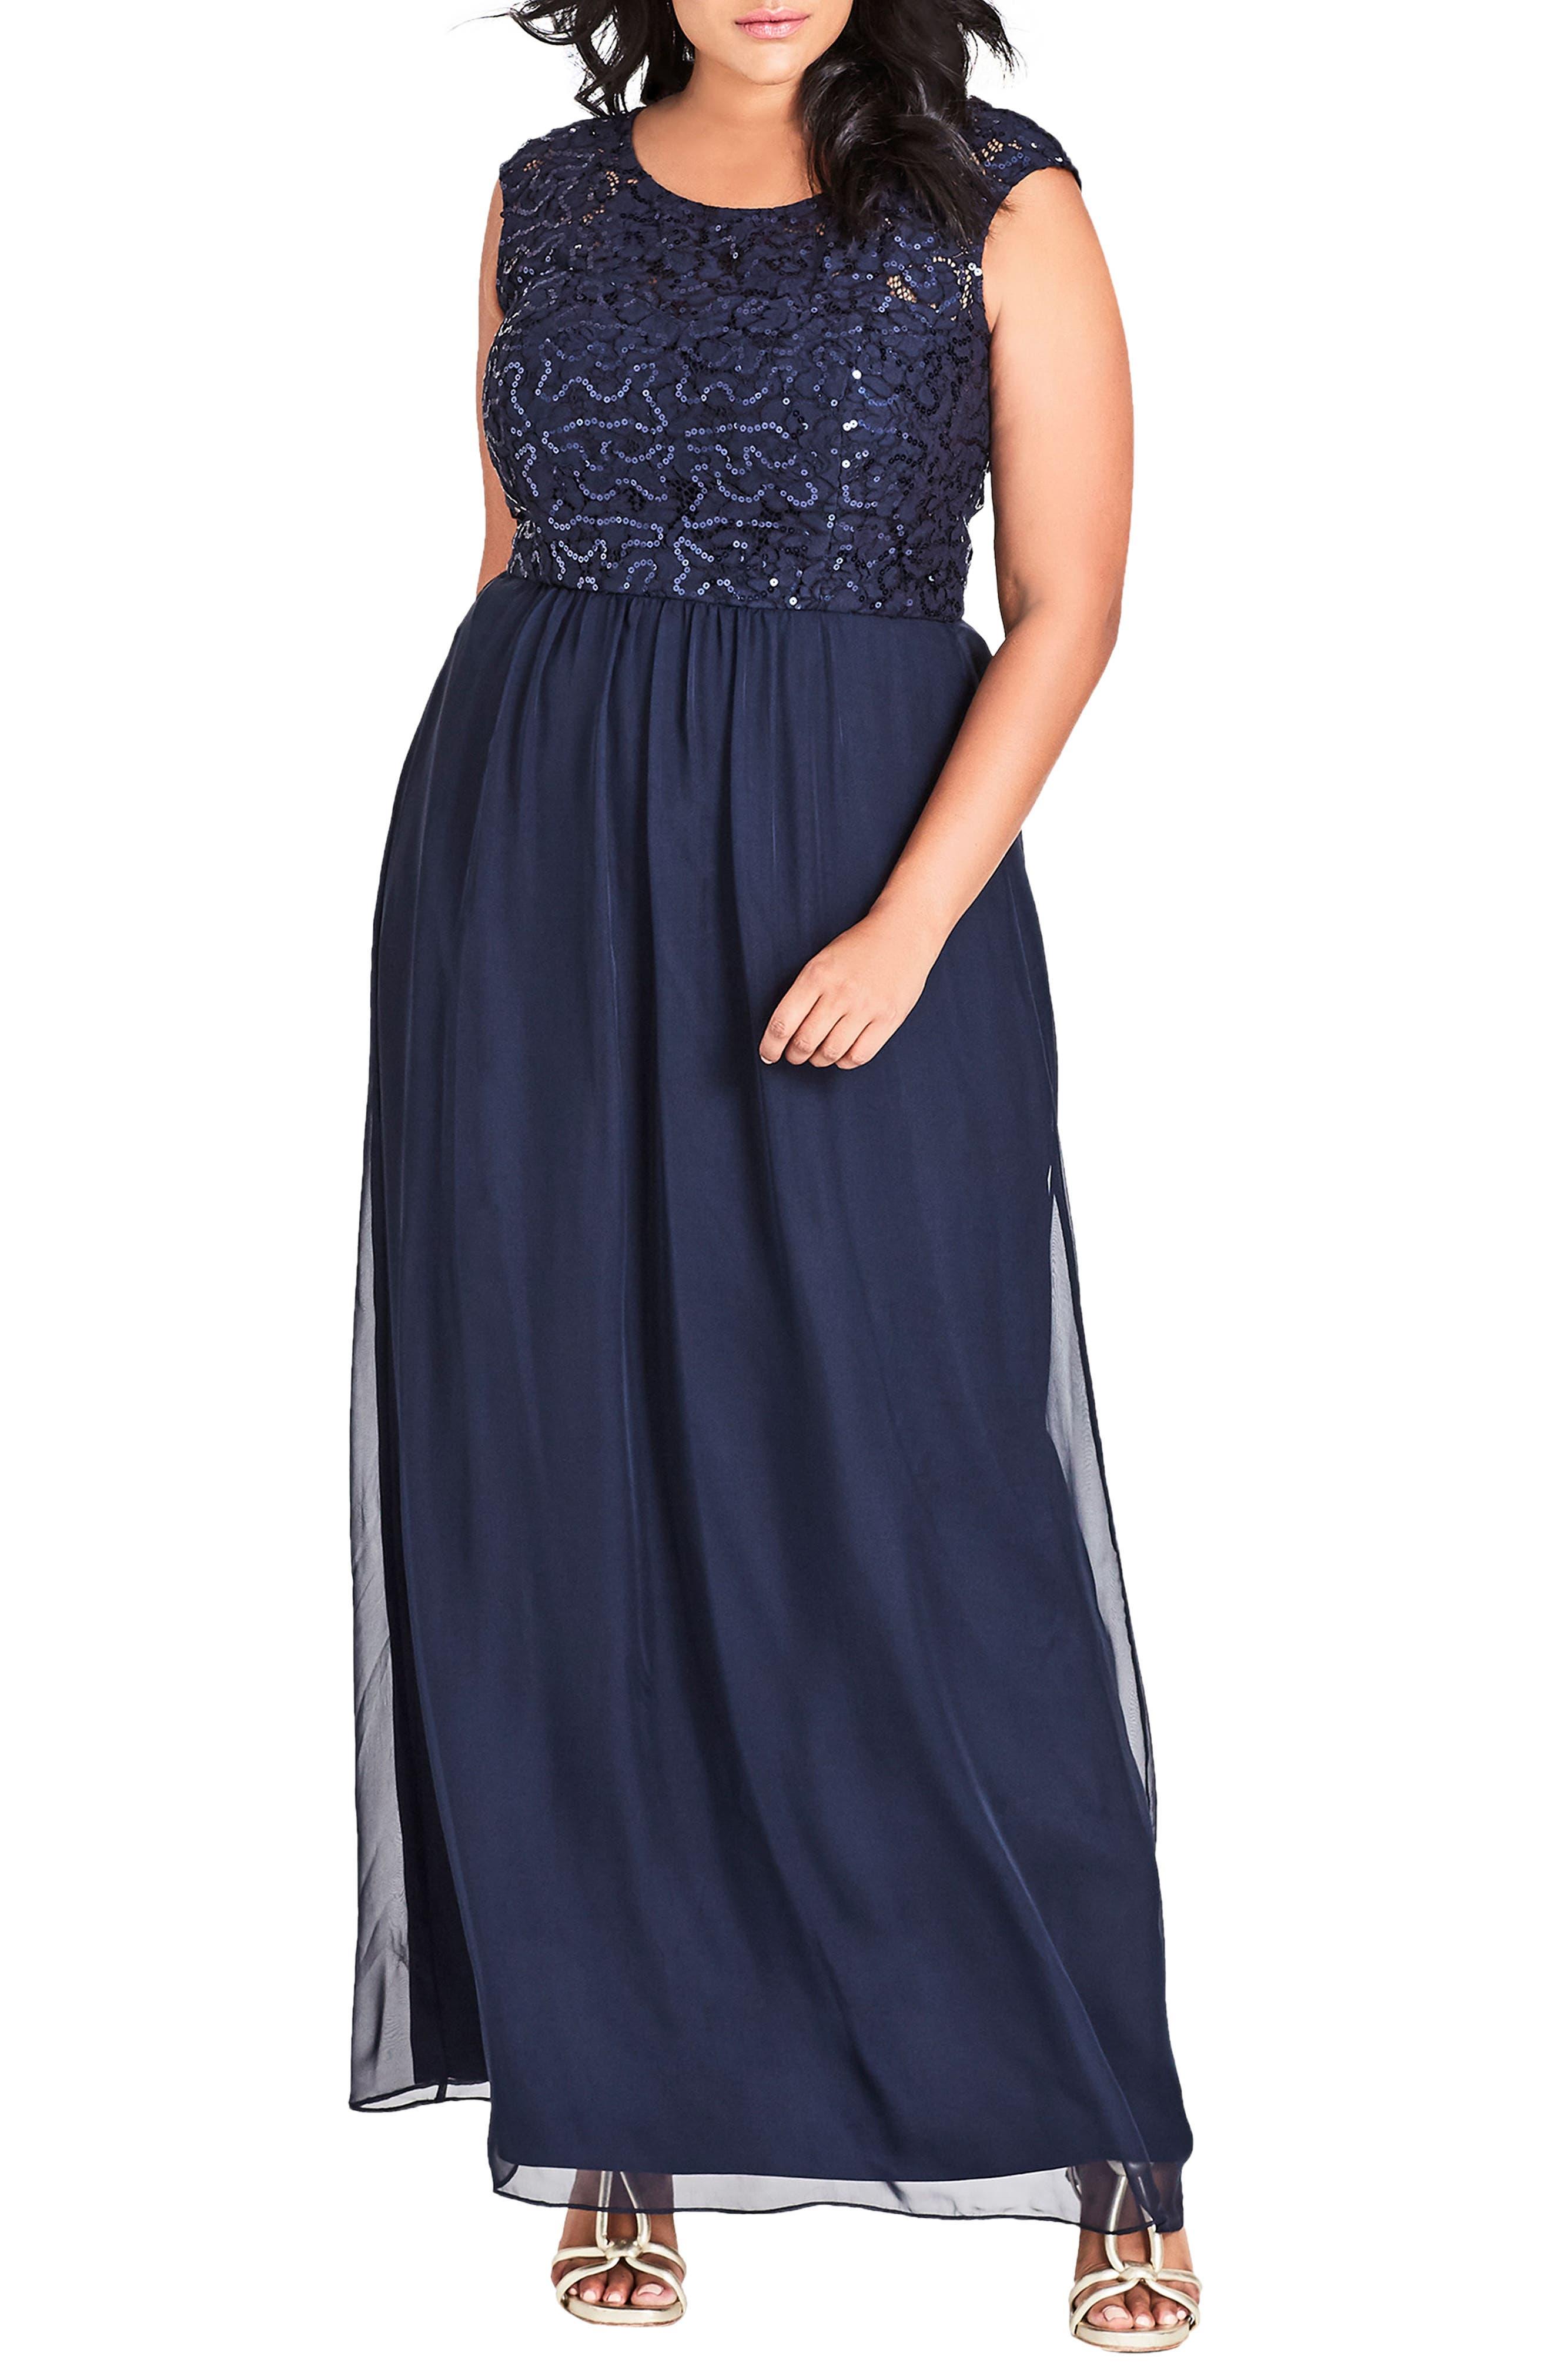 Sweet Love Maxi Dress,                         Main,                         color, NAVY